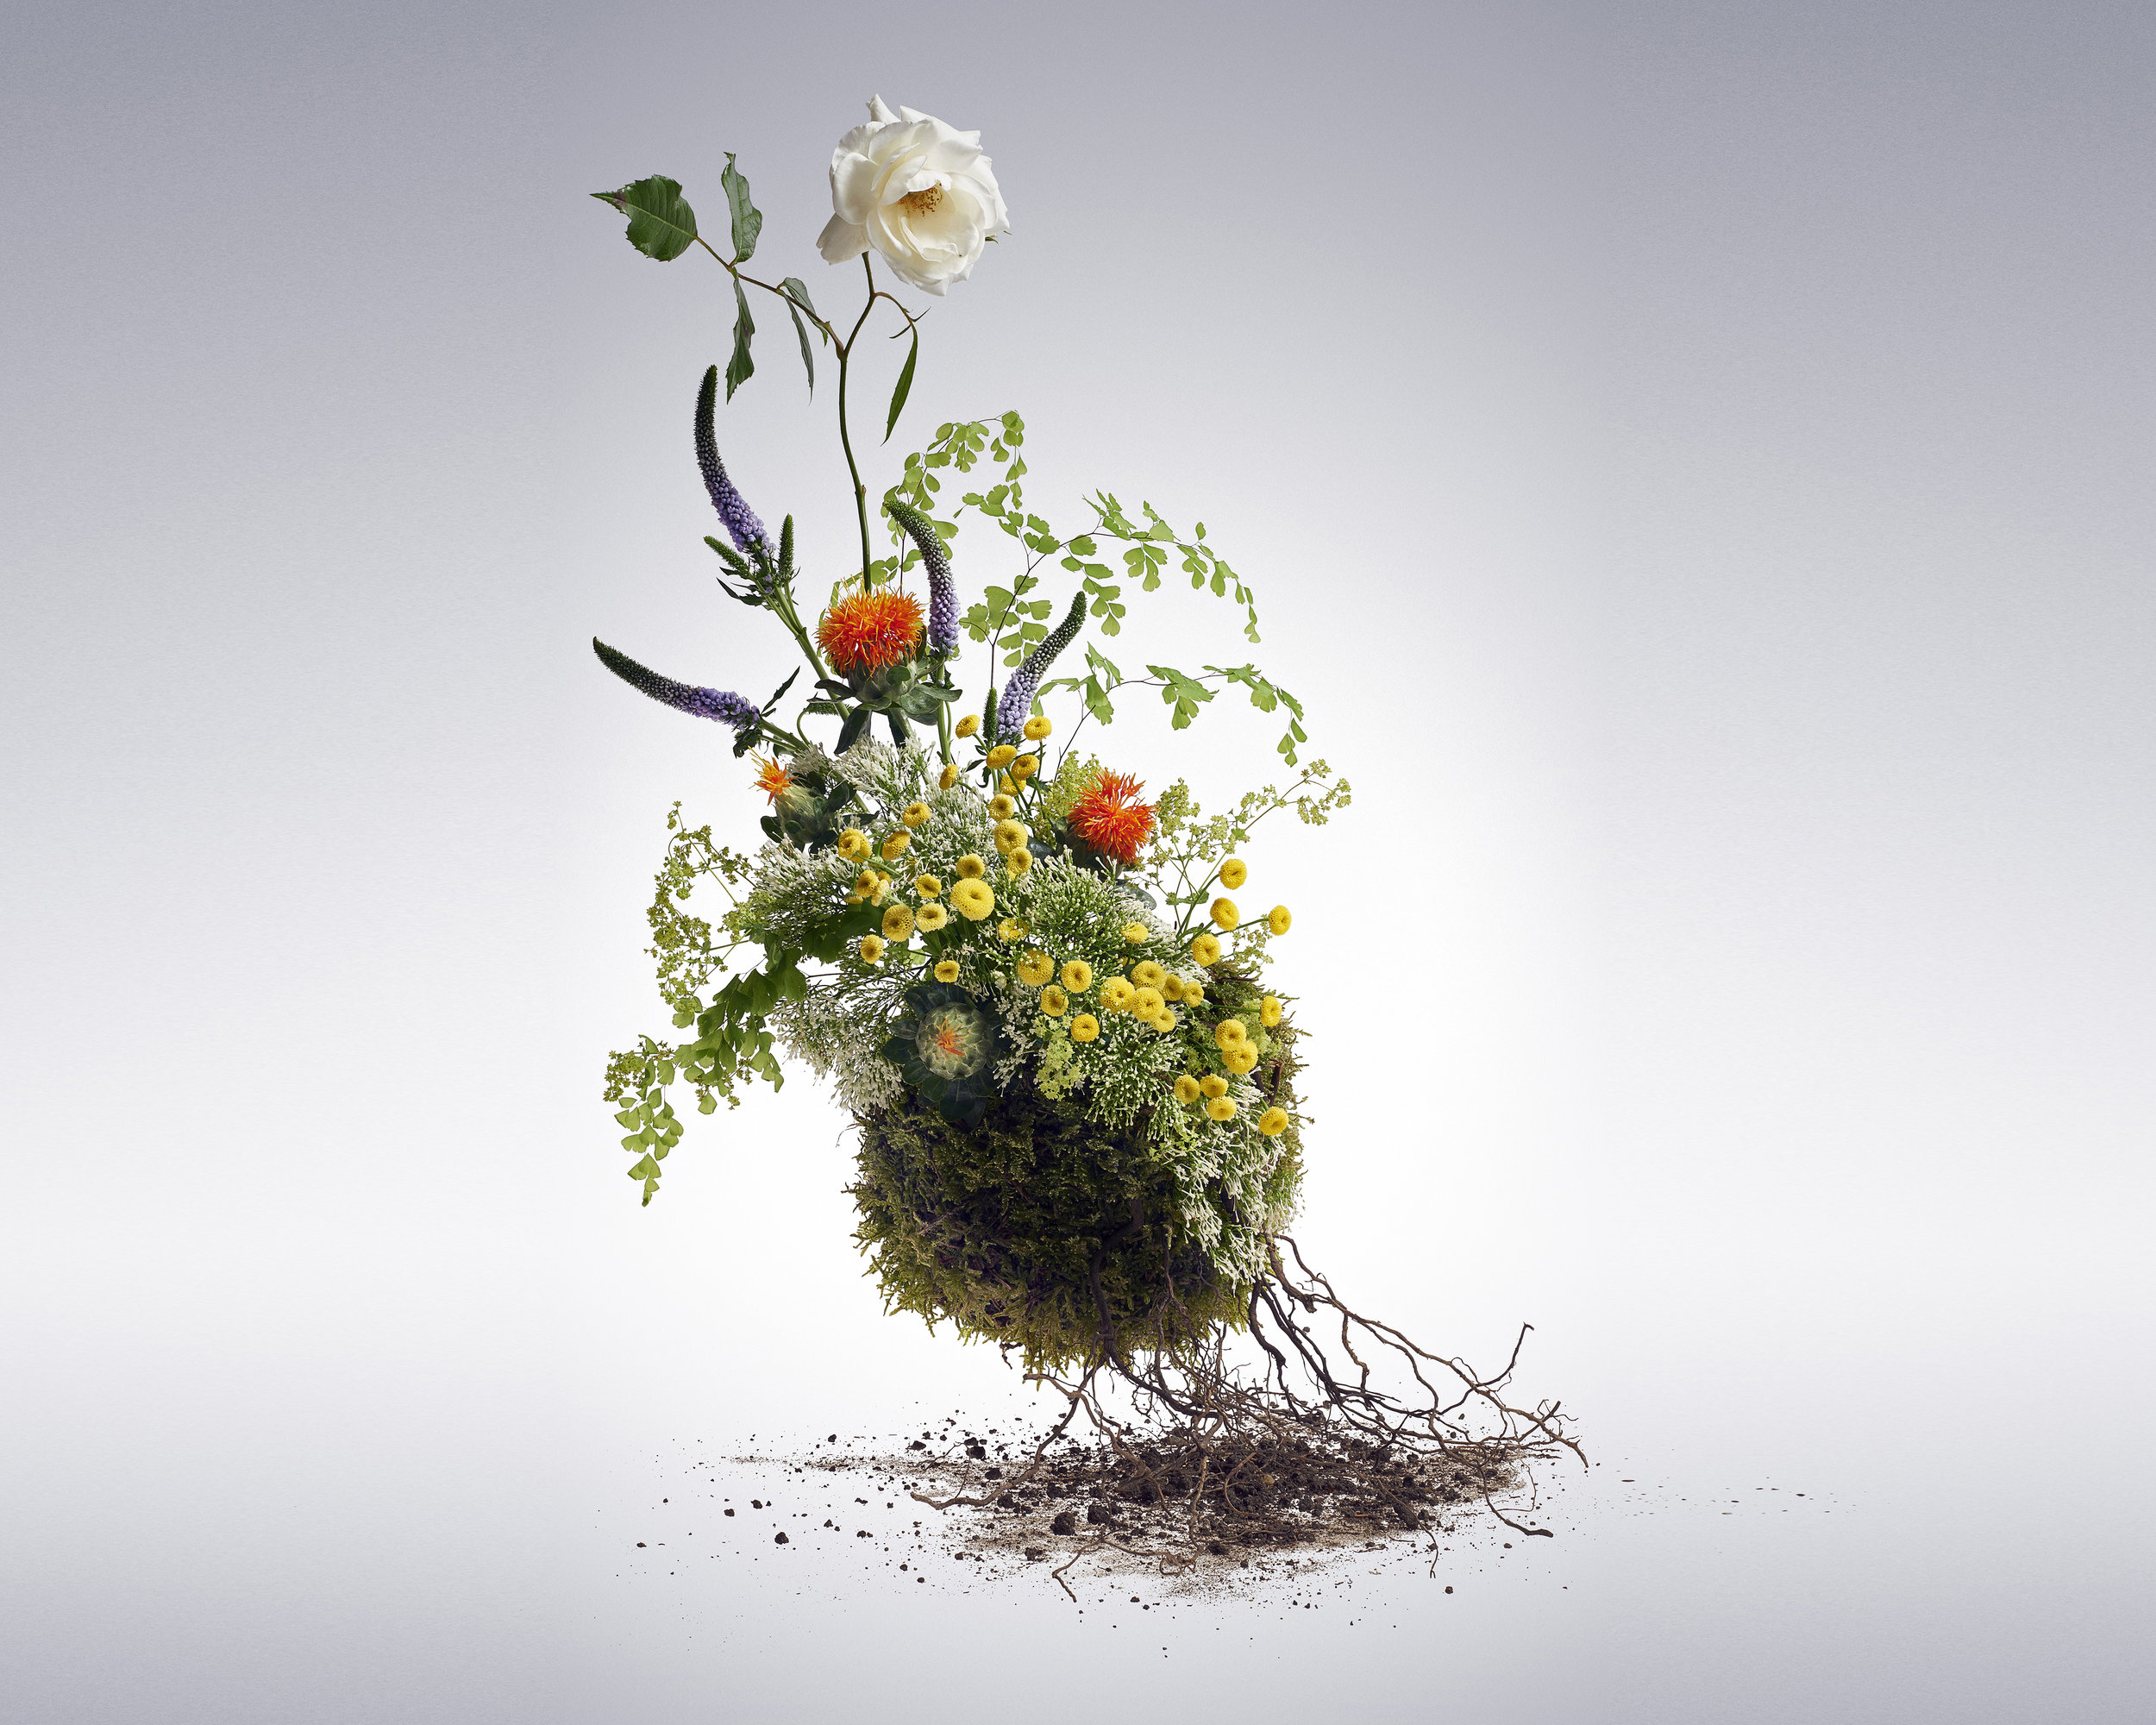 Flowers Still life Study - 2016 - Flower arrangement by  Carlotta Fenini